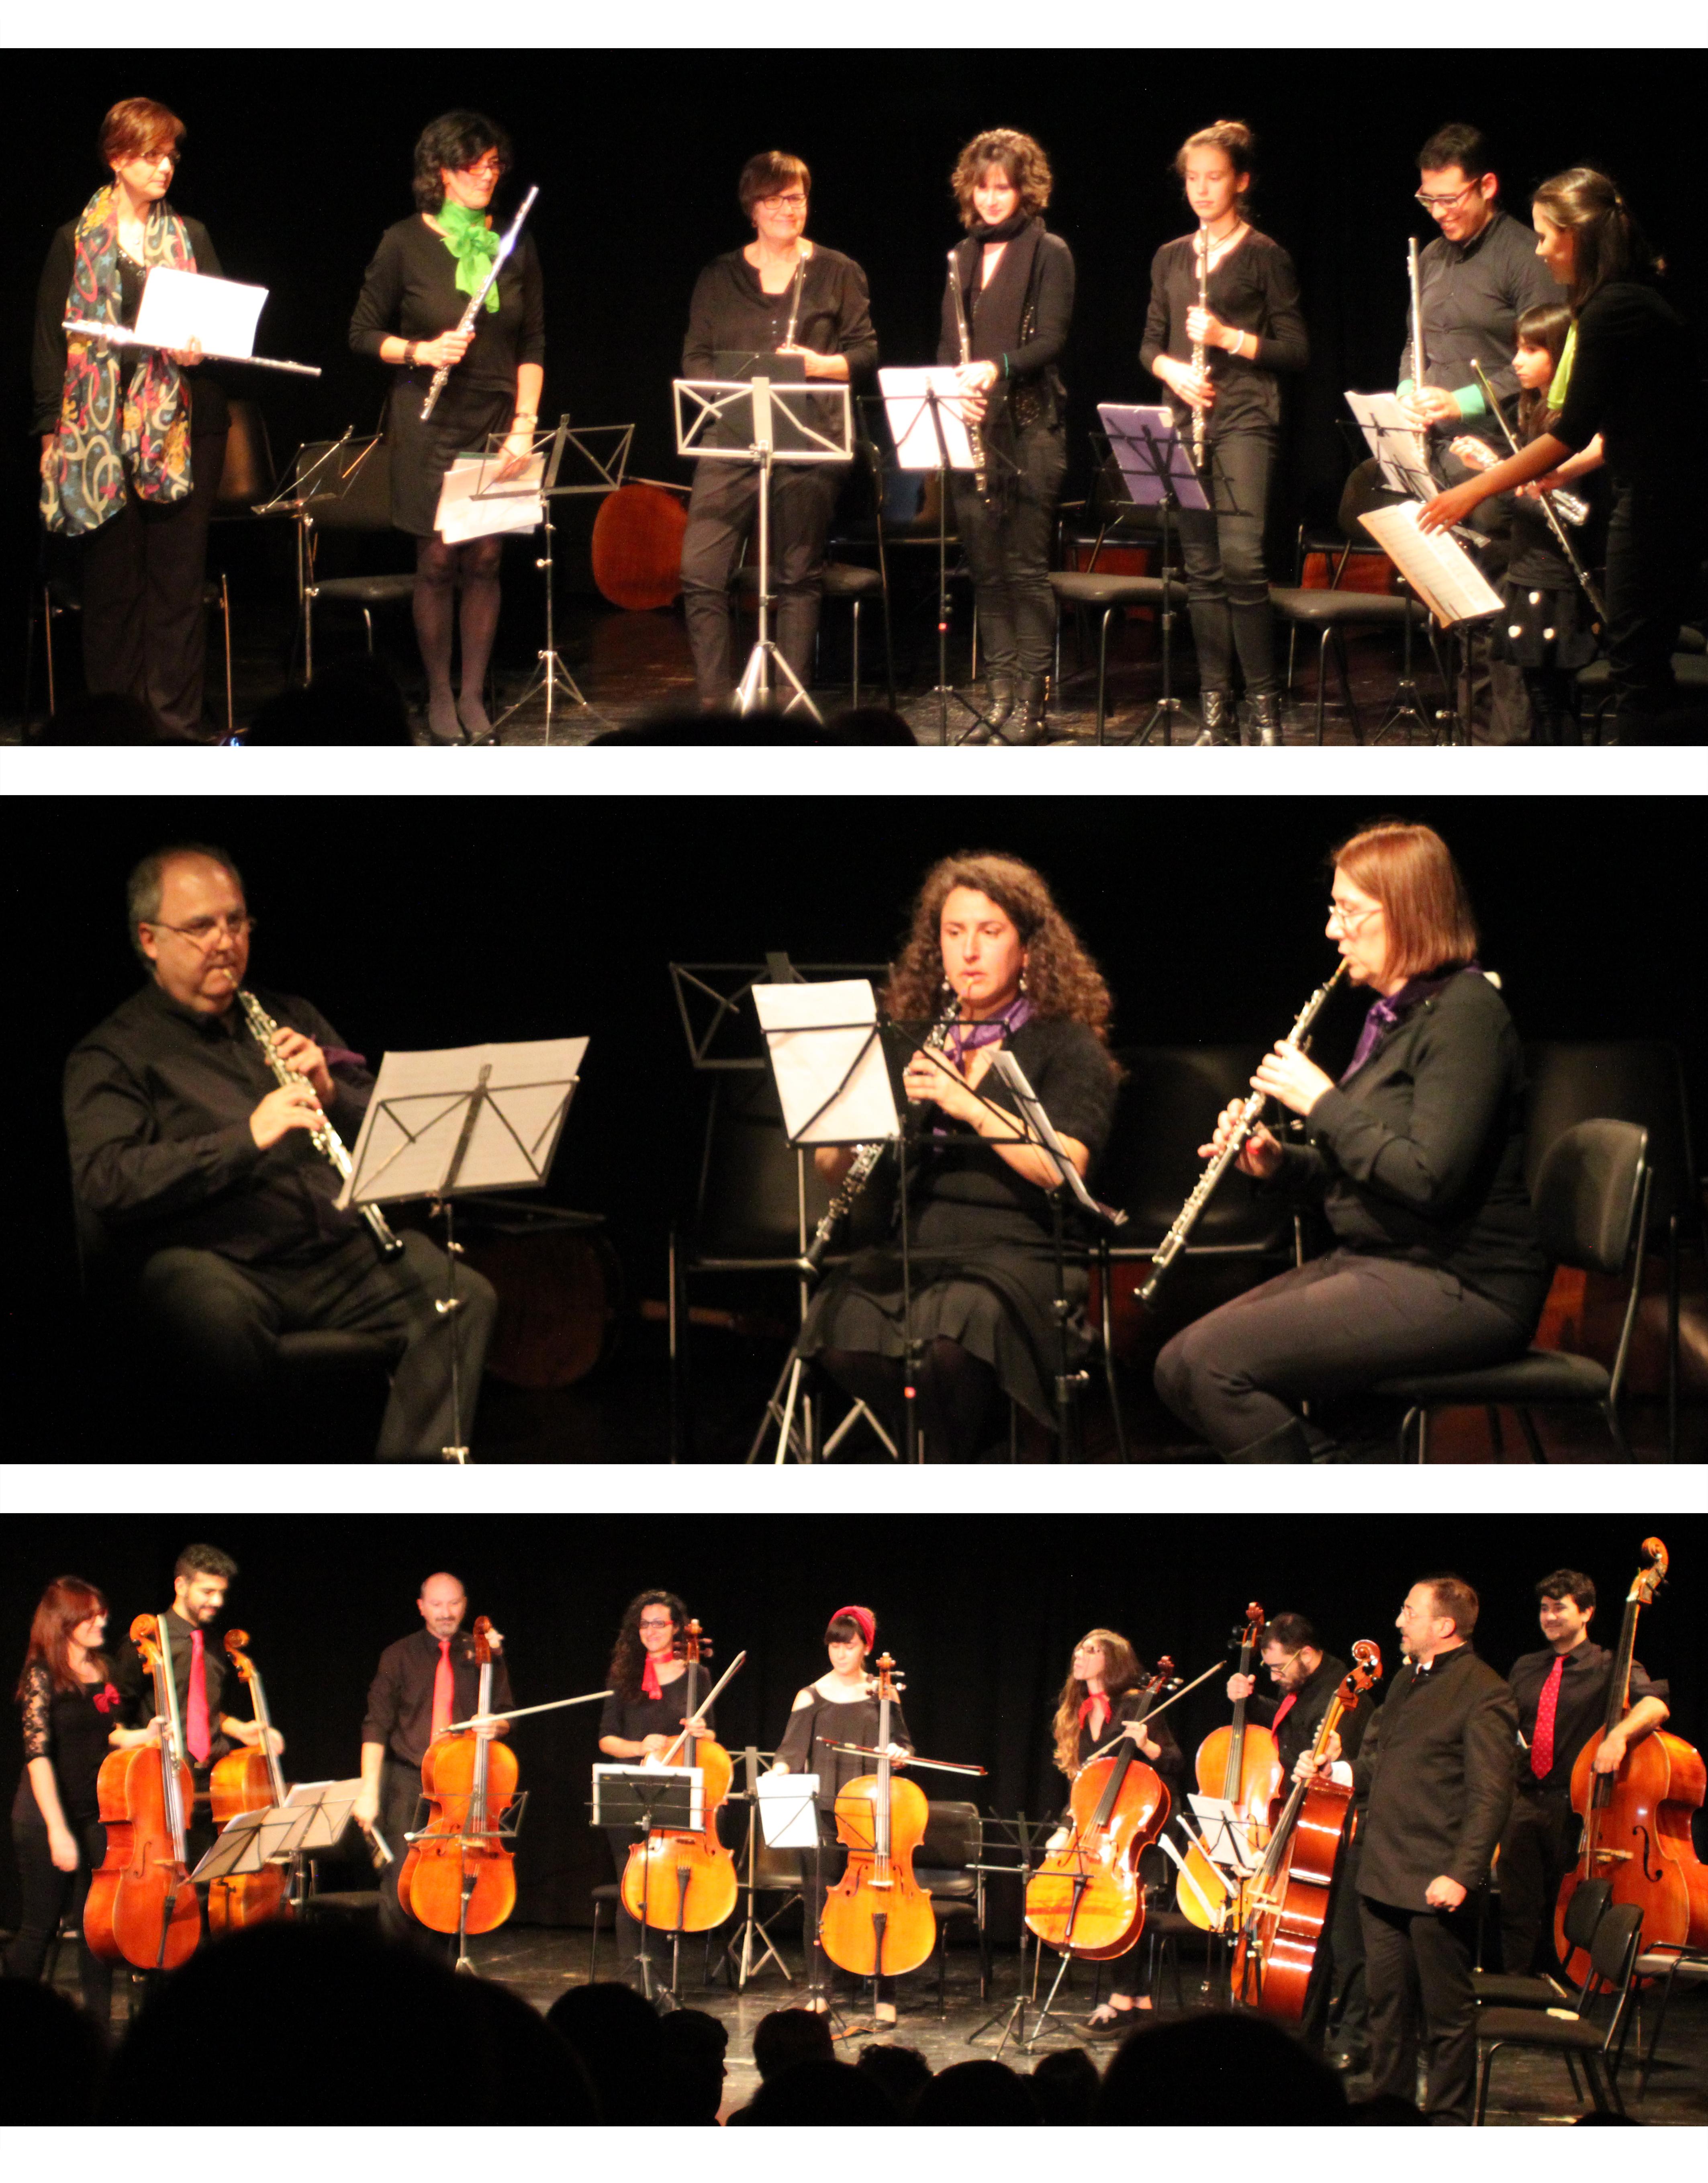 41.-Flautas-Oboes-y-Chelos